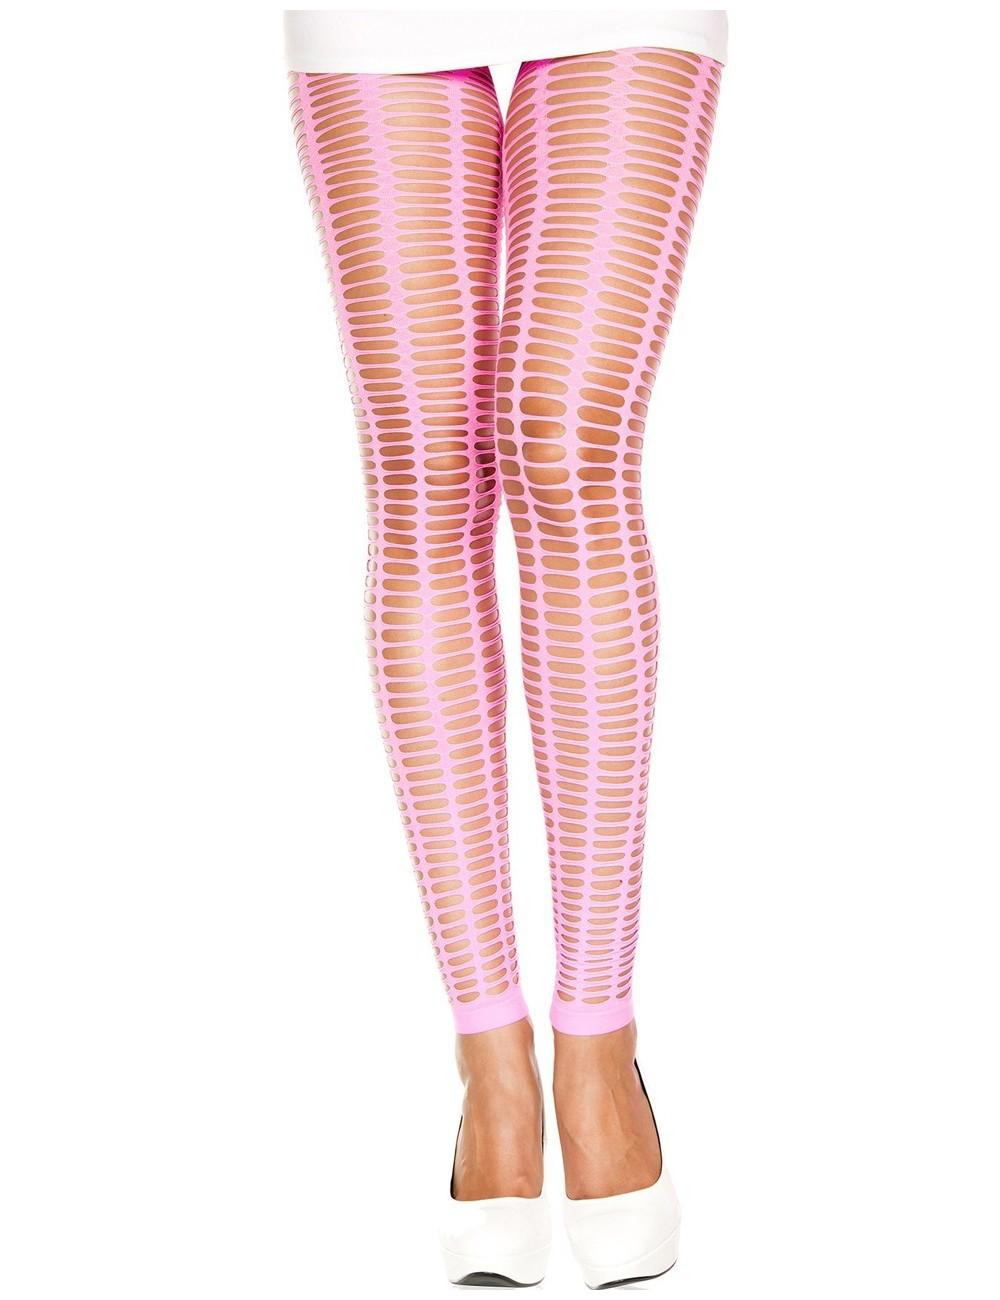 Lingerie - Leggings Sexy - Leggings rose fluo moulant ajouré petits trous - MH35442NEP - Music Legs